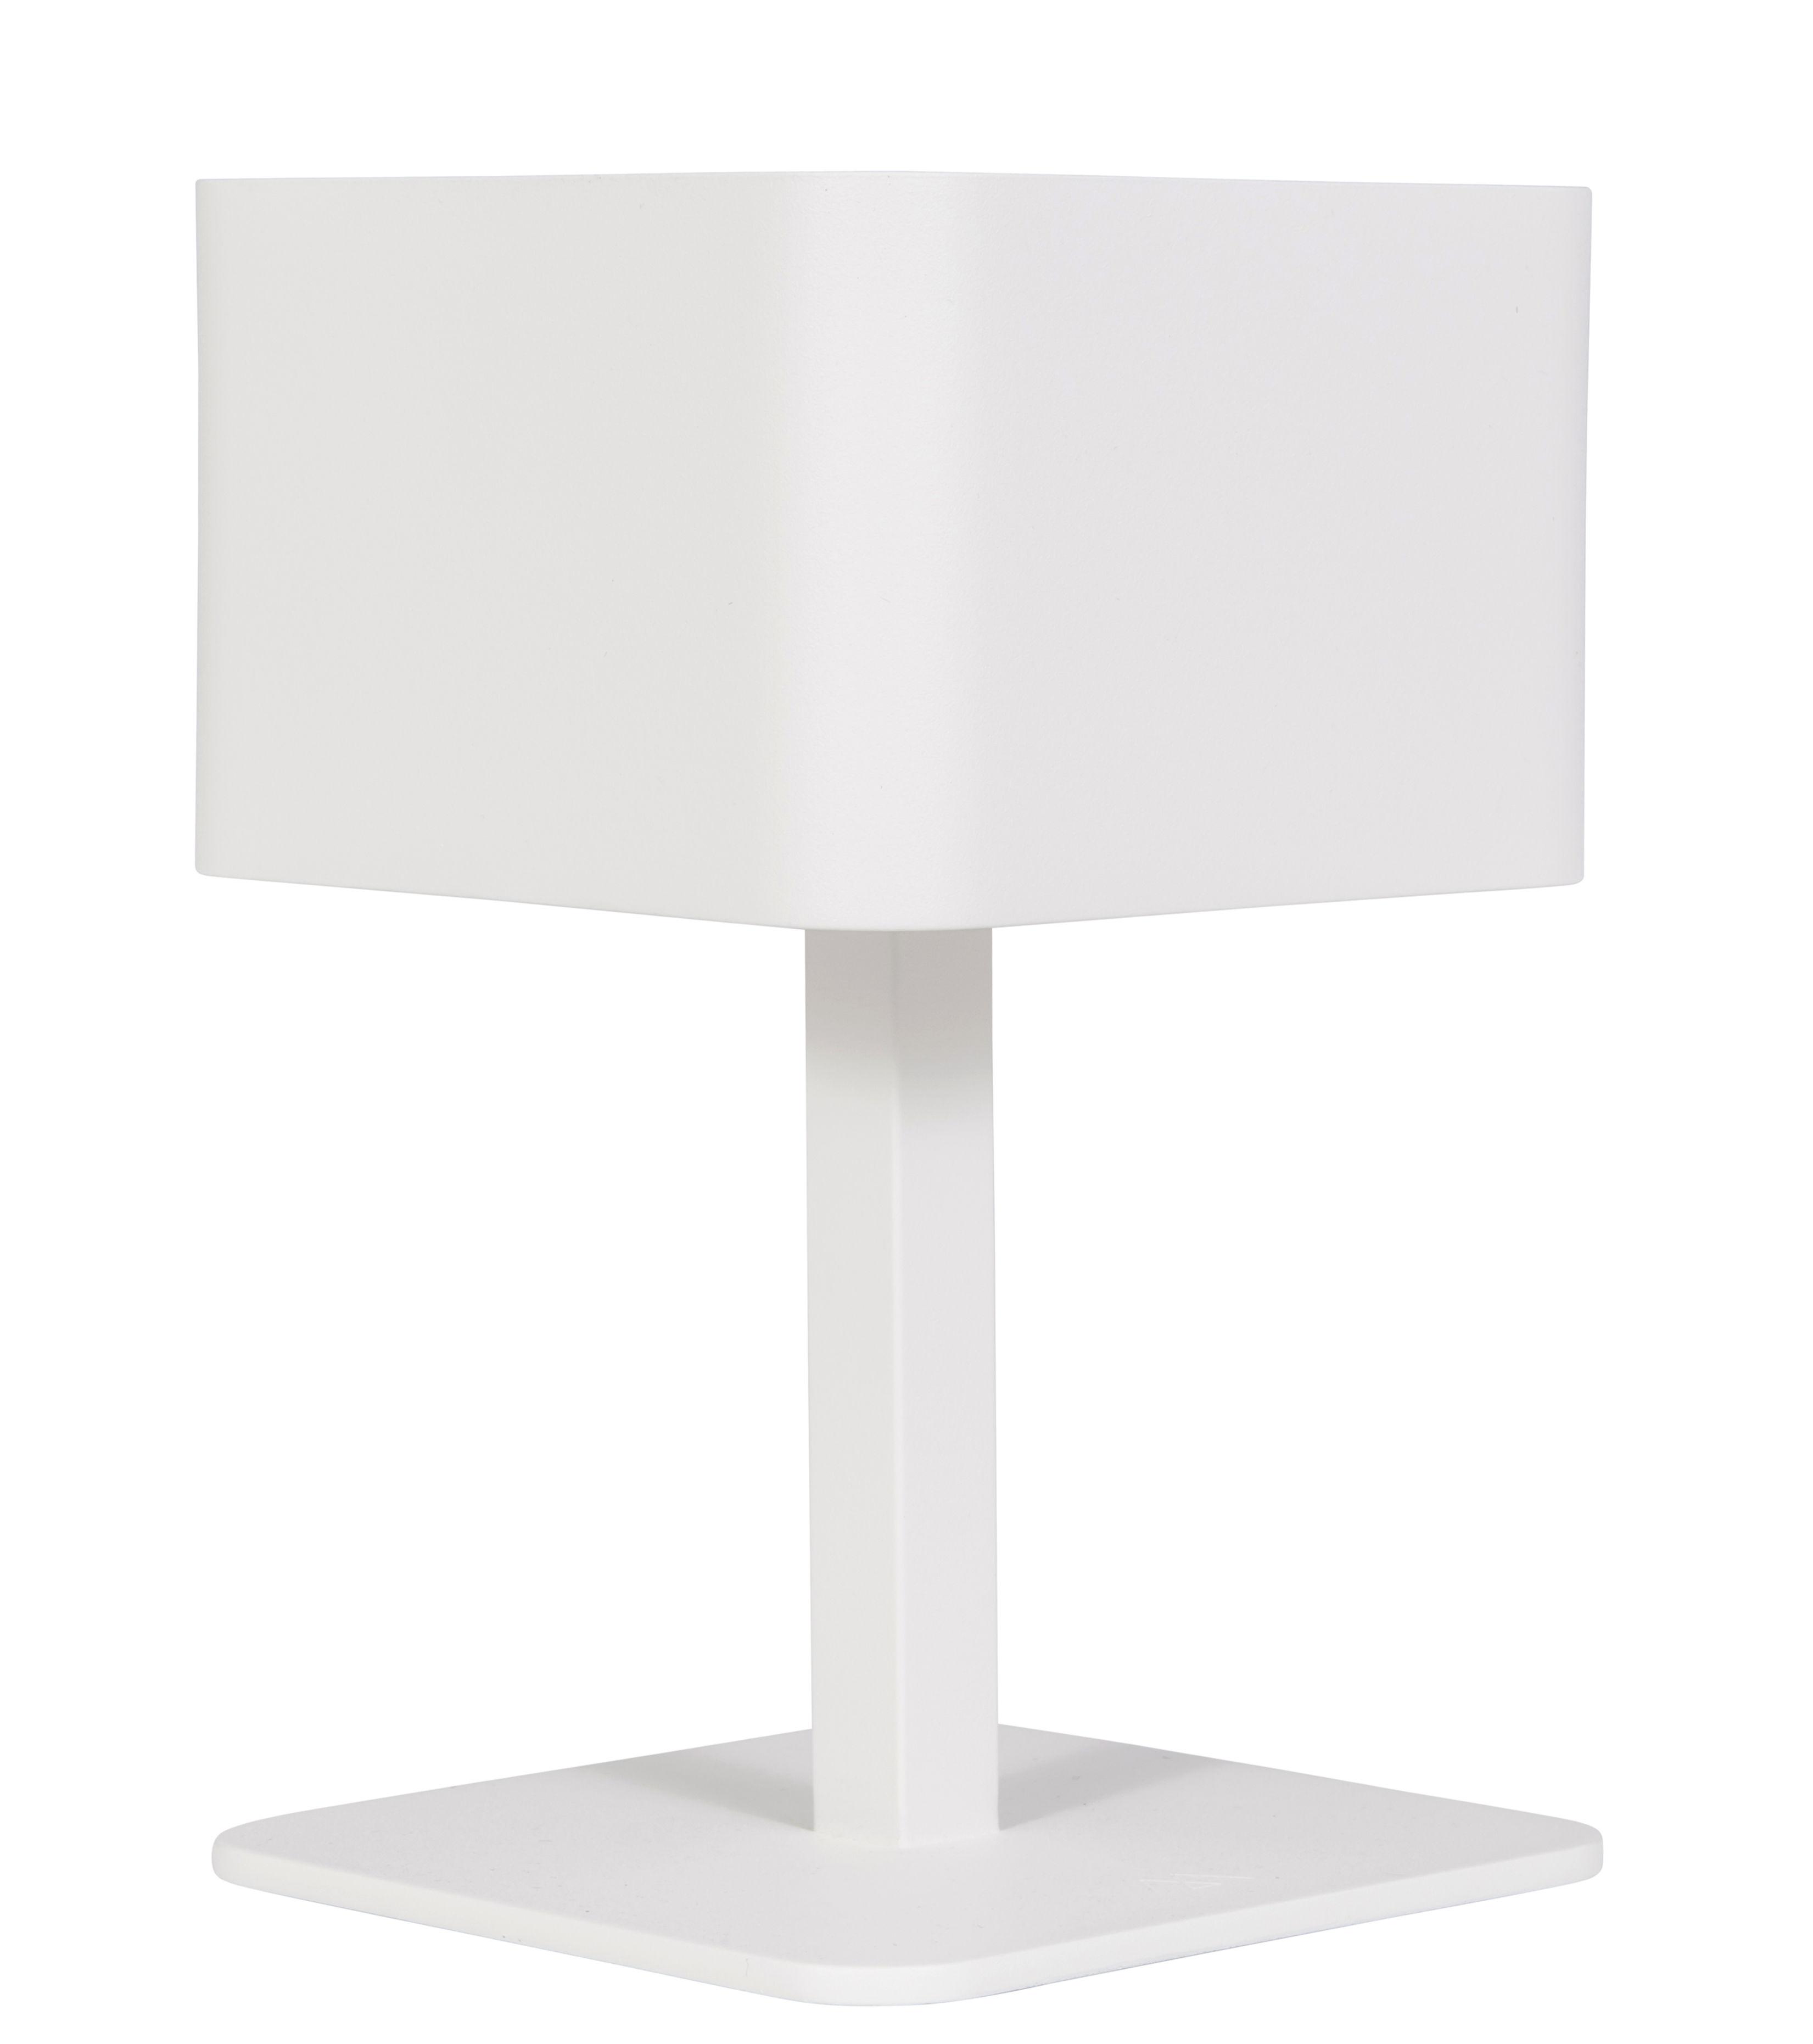 Lighting - Table Lamps - La Lampe Pose 02 Solar lamp by Maiori - White - Aluminium